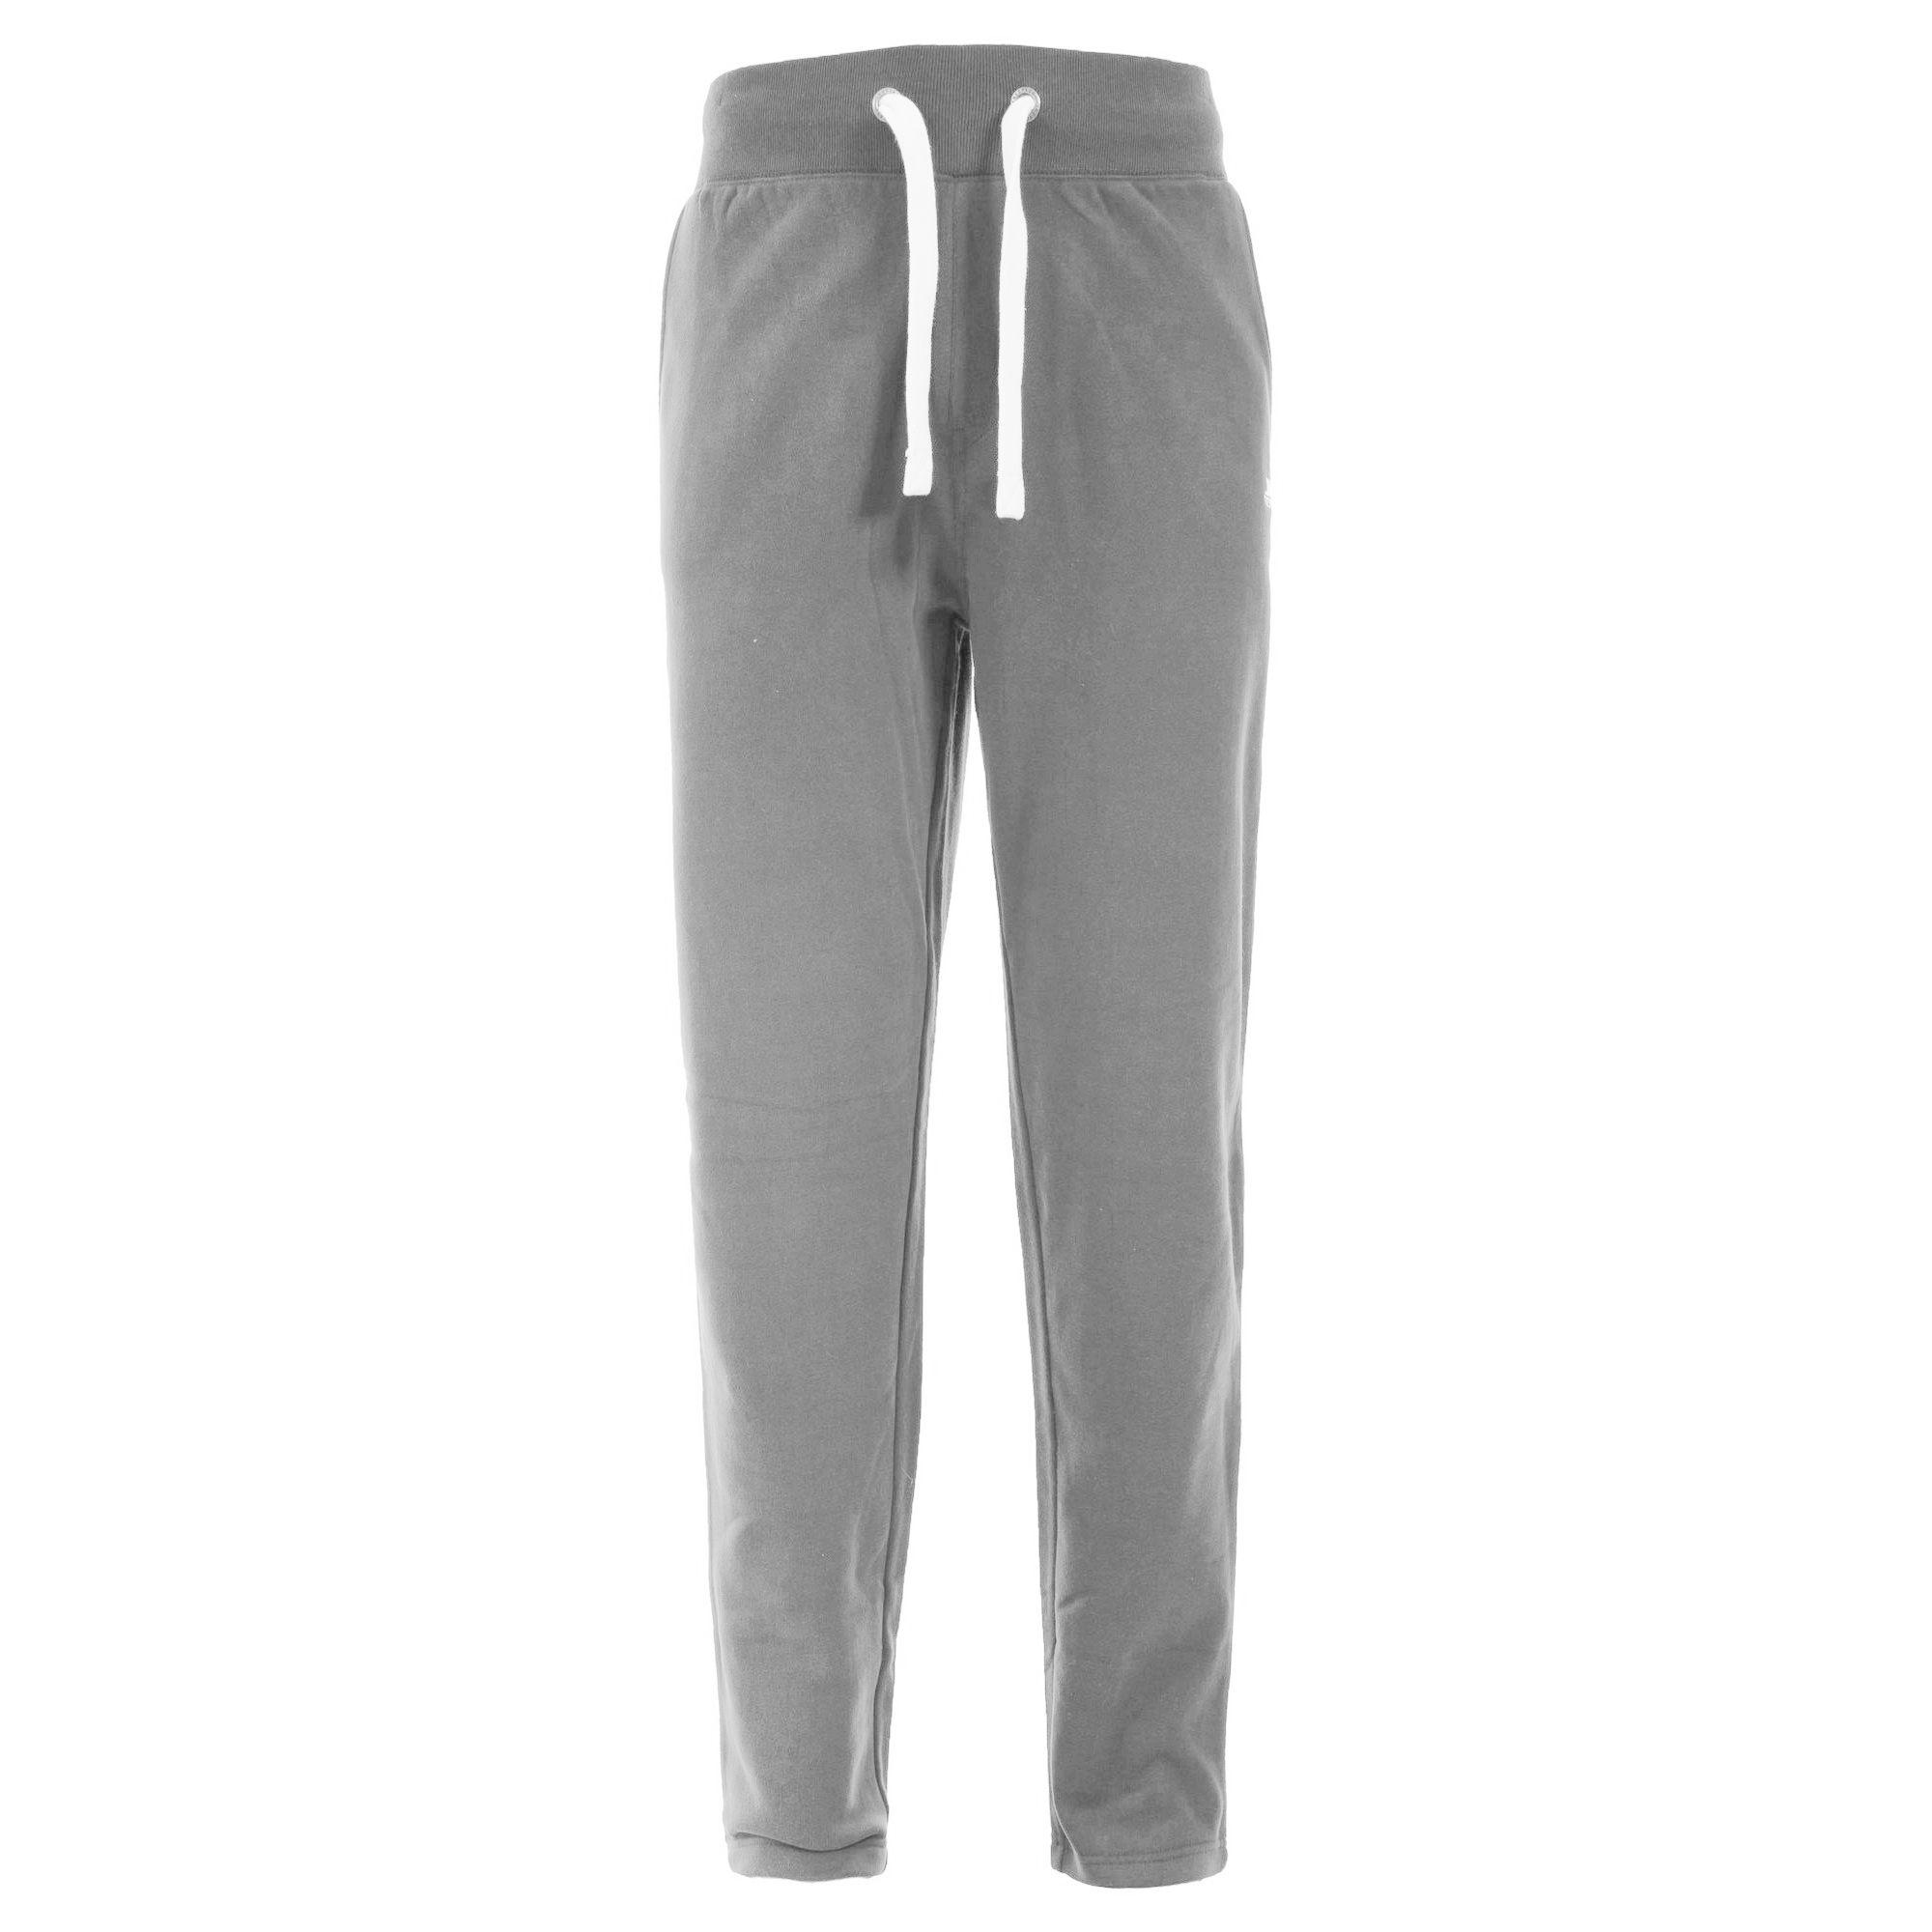 Trespass Mens Foynes Casual Jogging Bottoms/Trousers